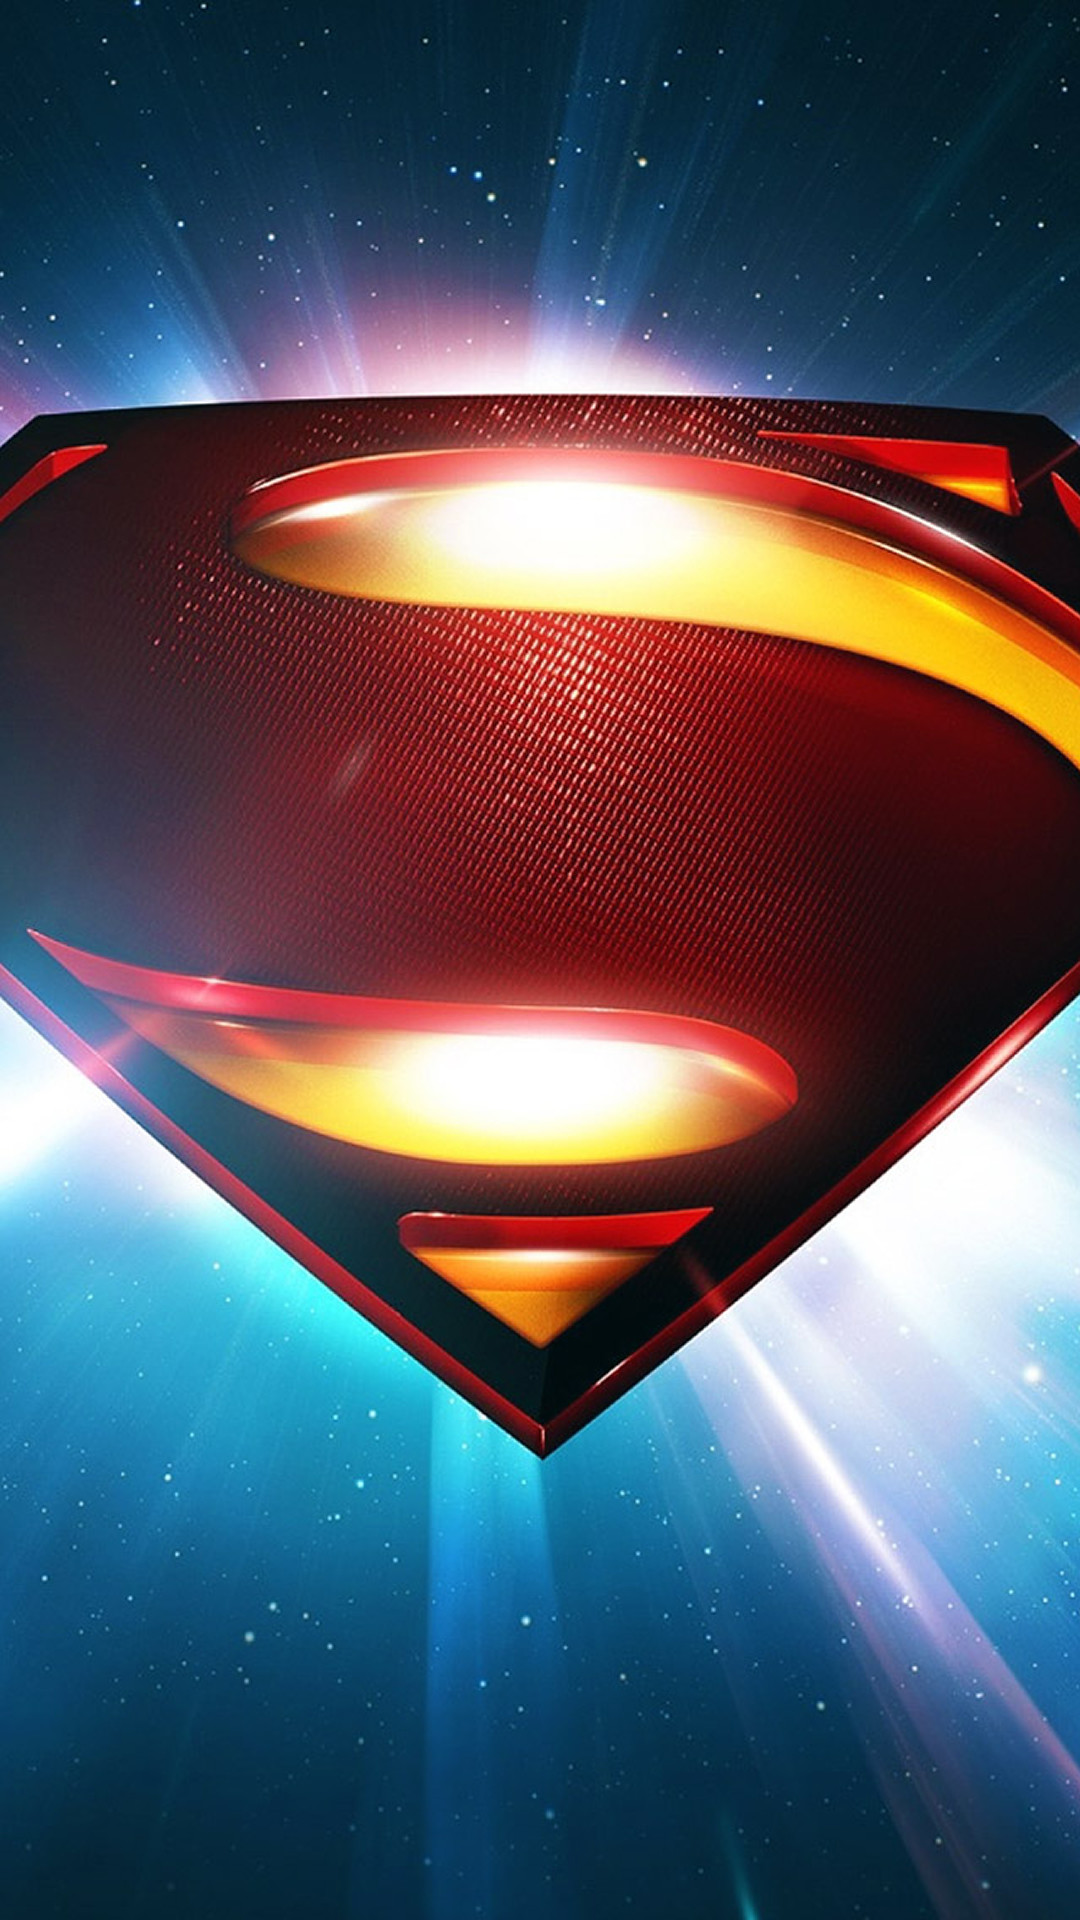 Superman Space Logo Man Of Steel iPhone 6 wallpaper